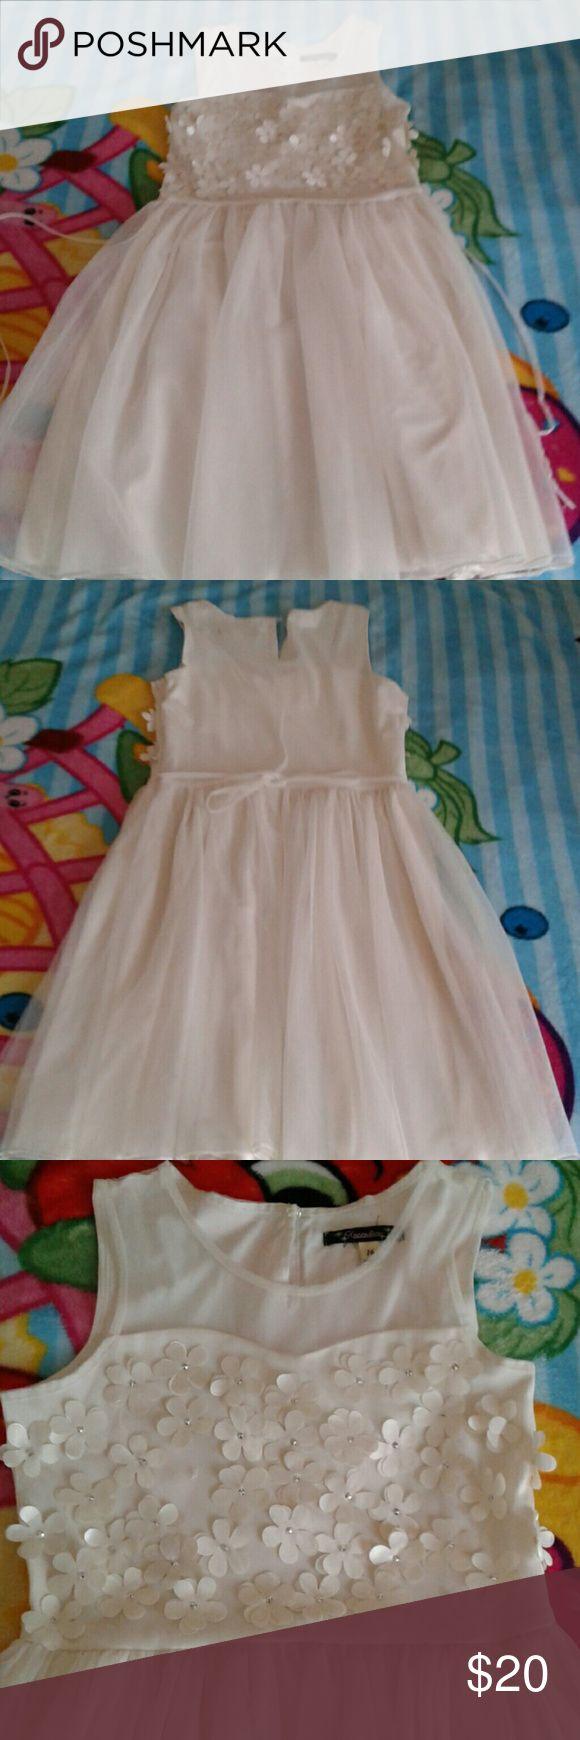 Girls beige summer dress size 16 Beautiful girls summer dress size 16 like new Xtraordinary Dresses Casual